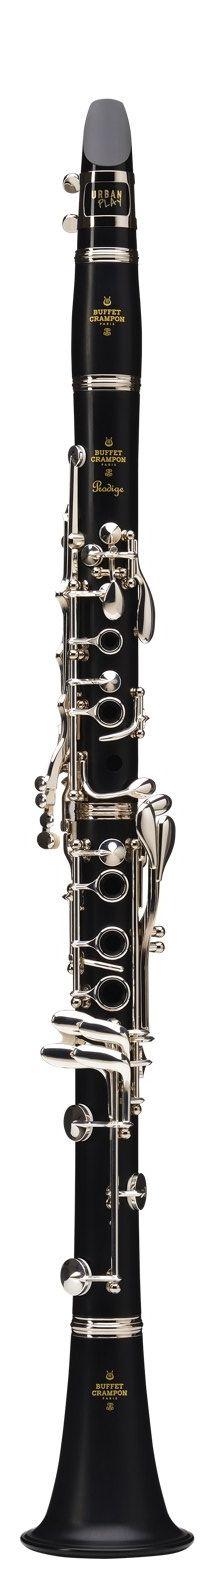 Buffet Crampon B flat Clarinet - Prodige